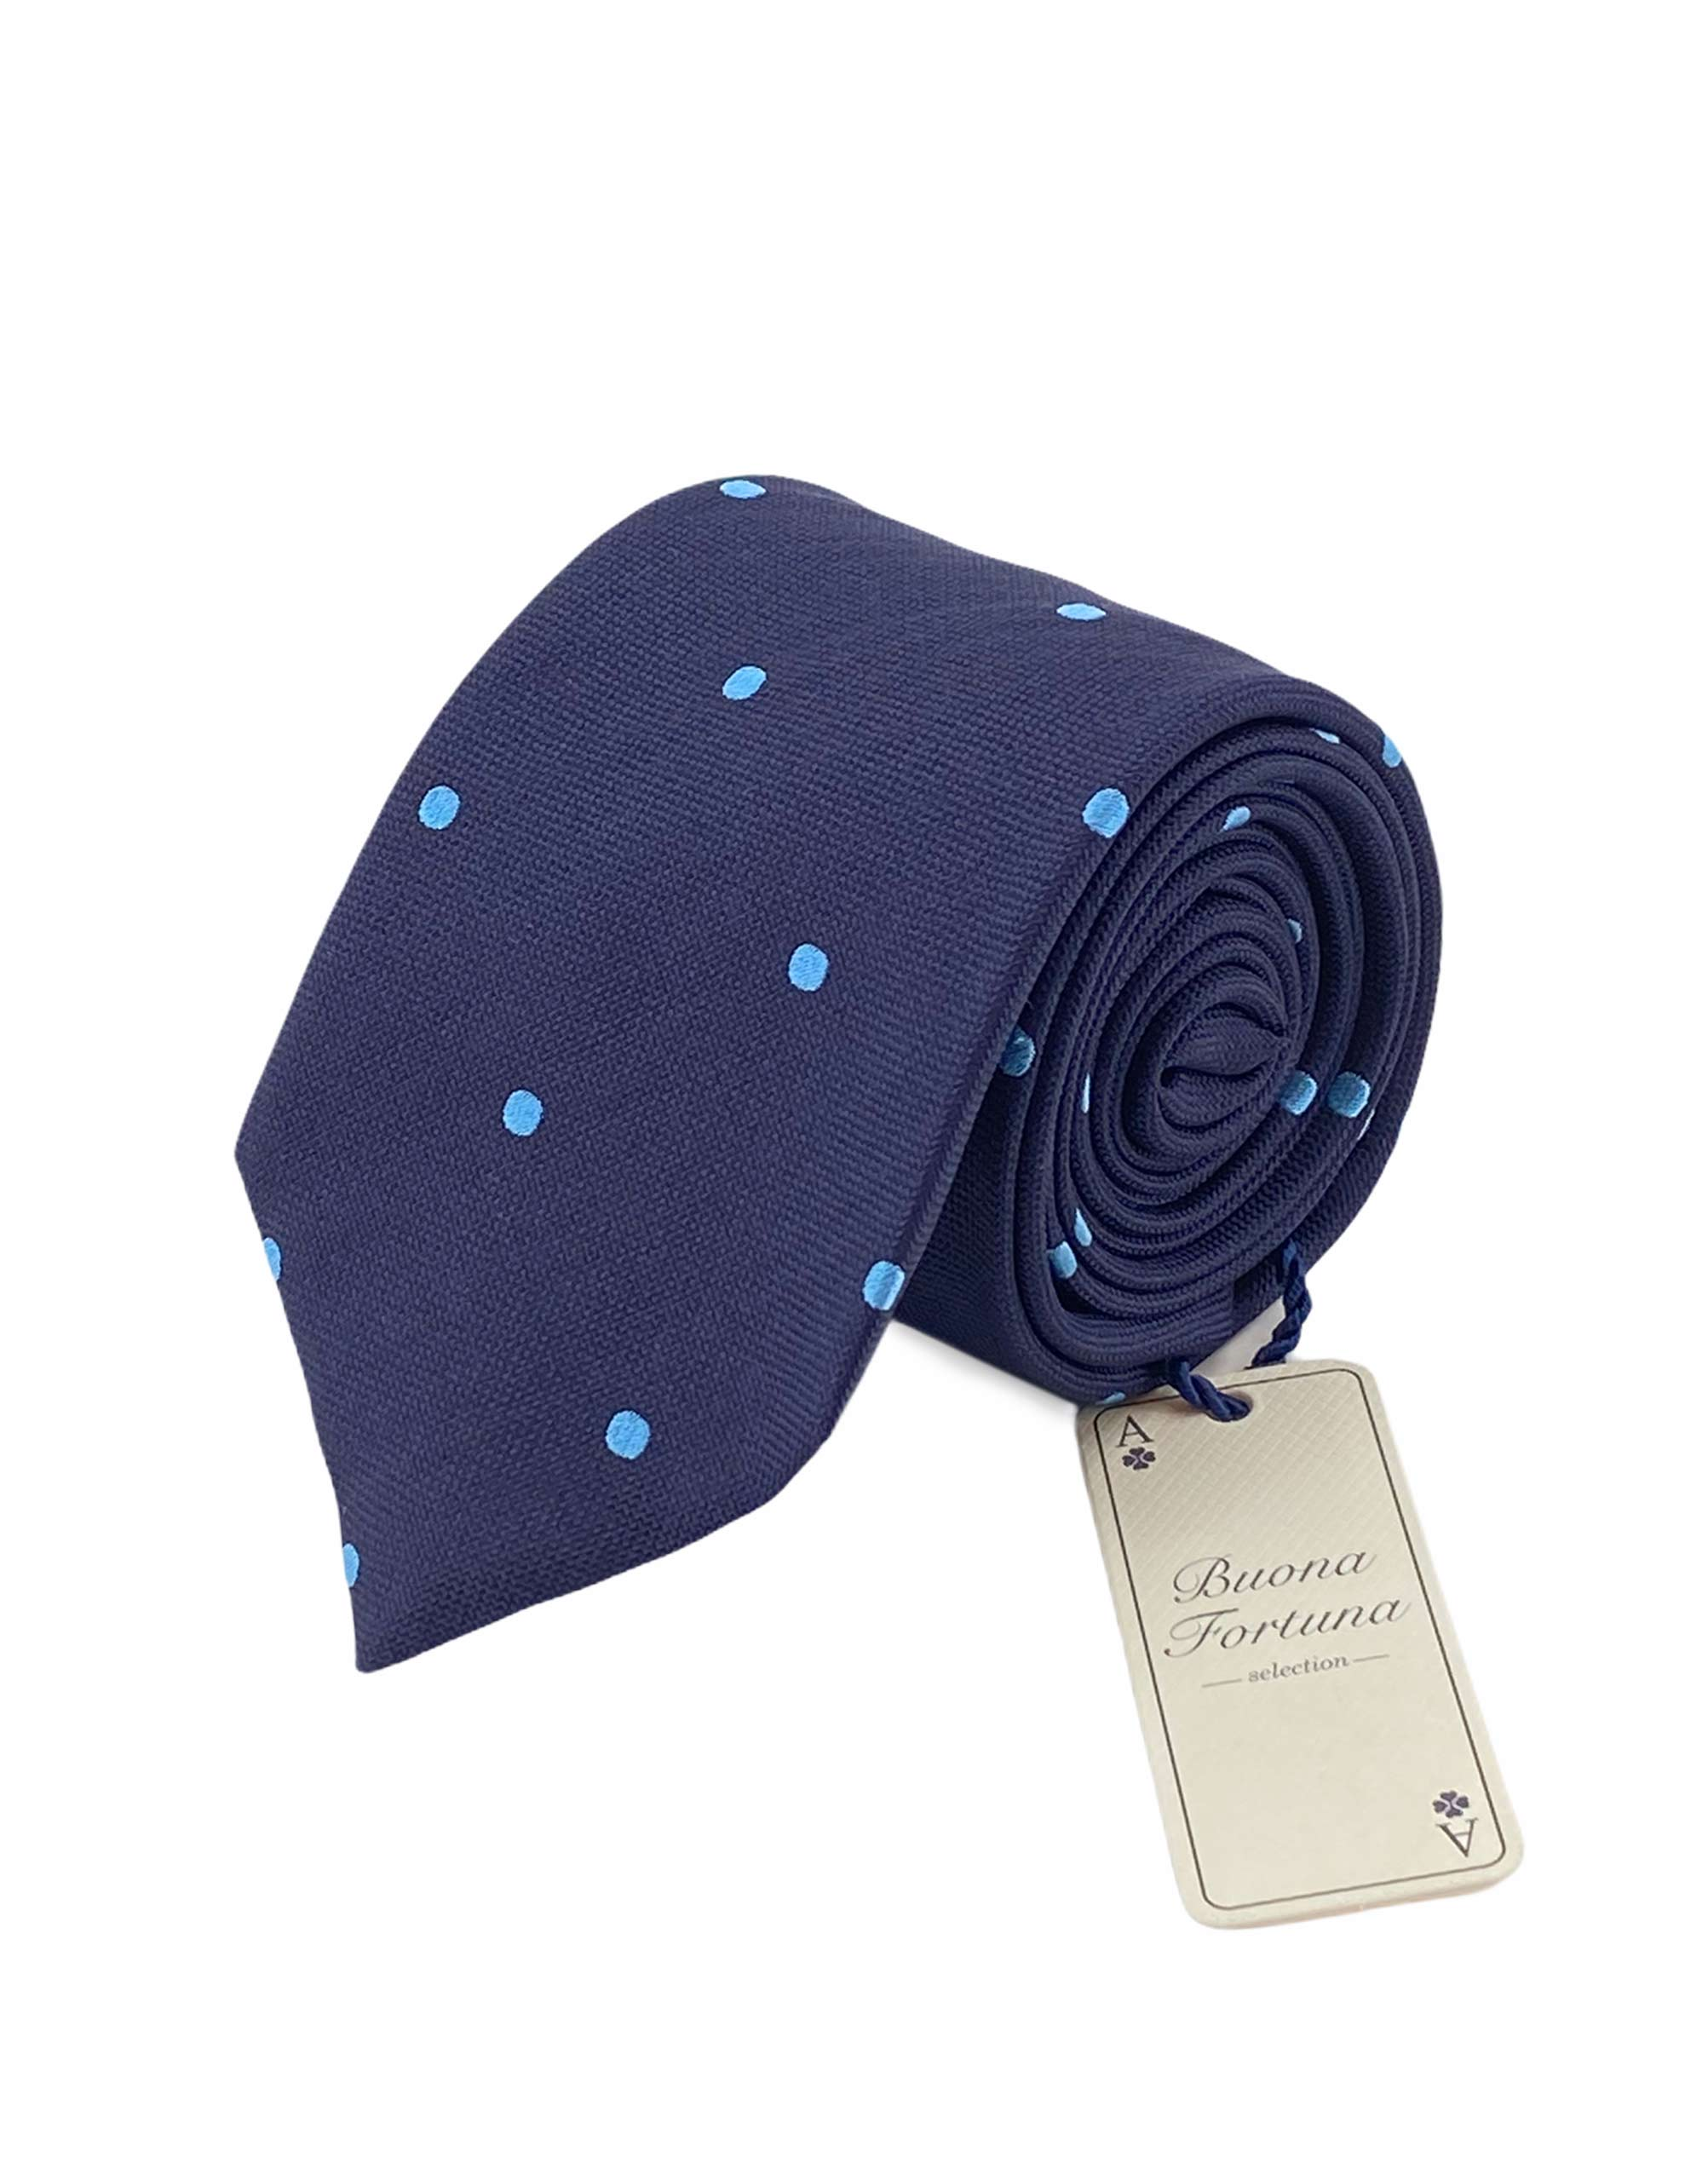 corbata seda tejida jacquard buona fortuna comprar online corbatas italianas exclusivas shop